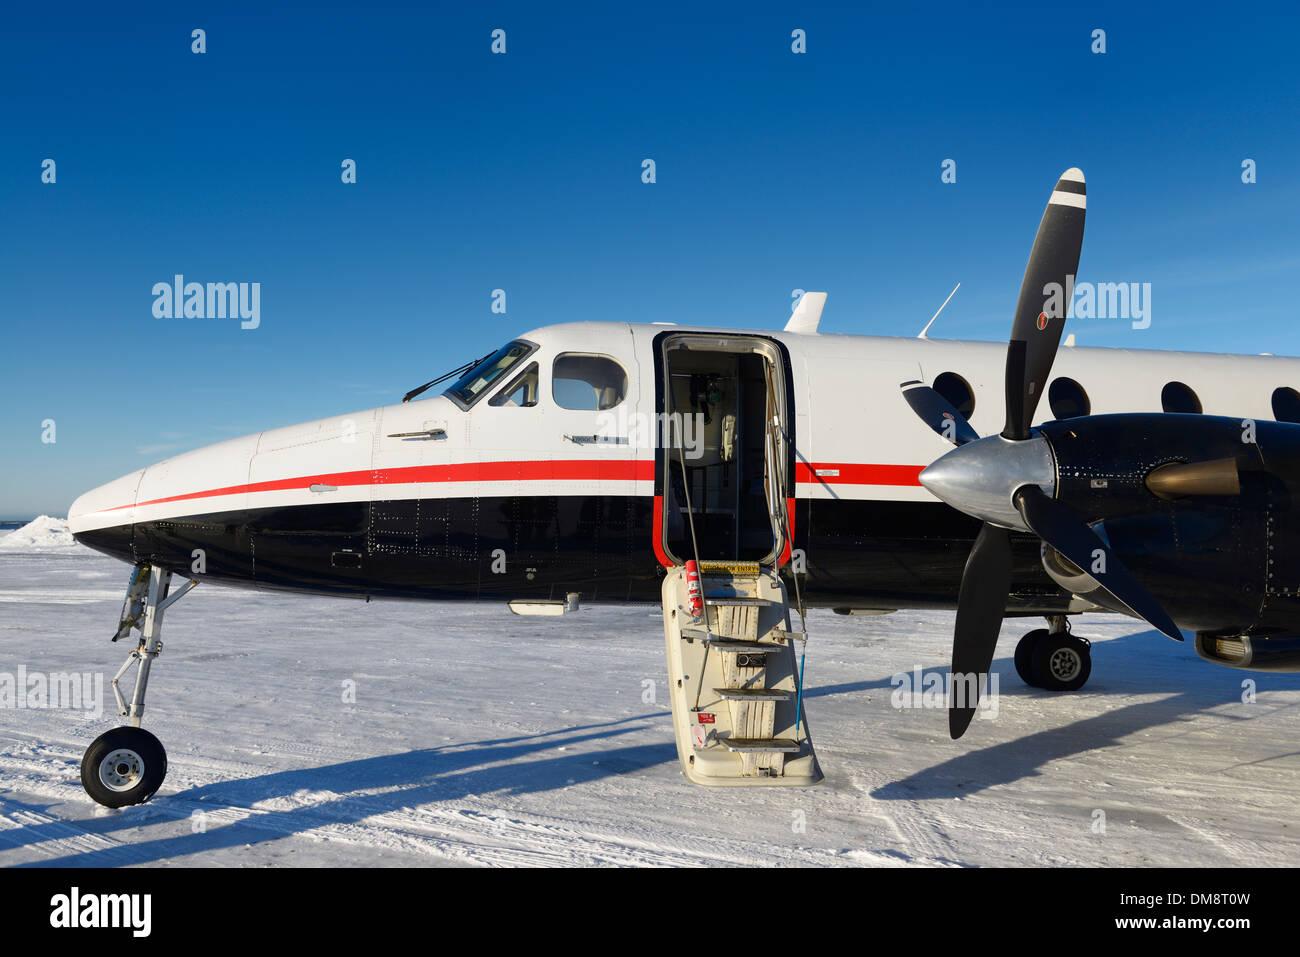 Empty Beechcraft turboprop aircraft at snow covered Barter Island LRRS airport at Kaktovik Alaska USA - Stock Image